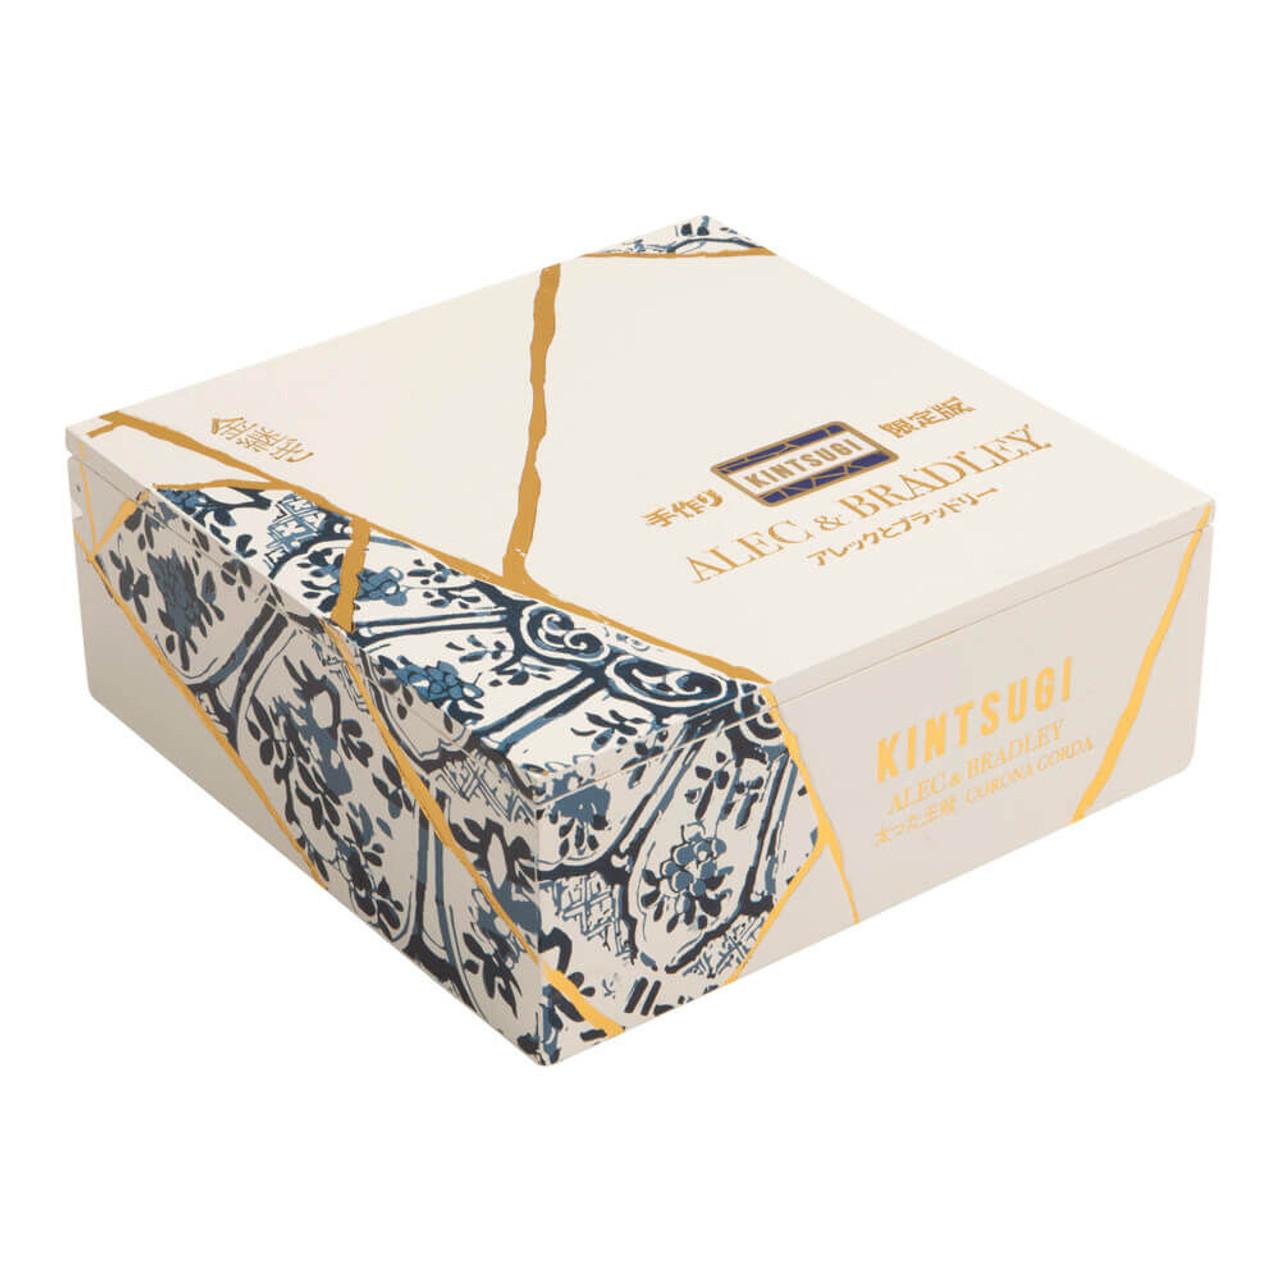 Alec & Bradley Kintsugi Corona Gorda Cigars - 5.63 x 46 (Box of 24)